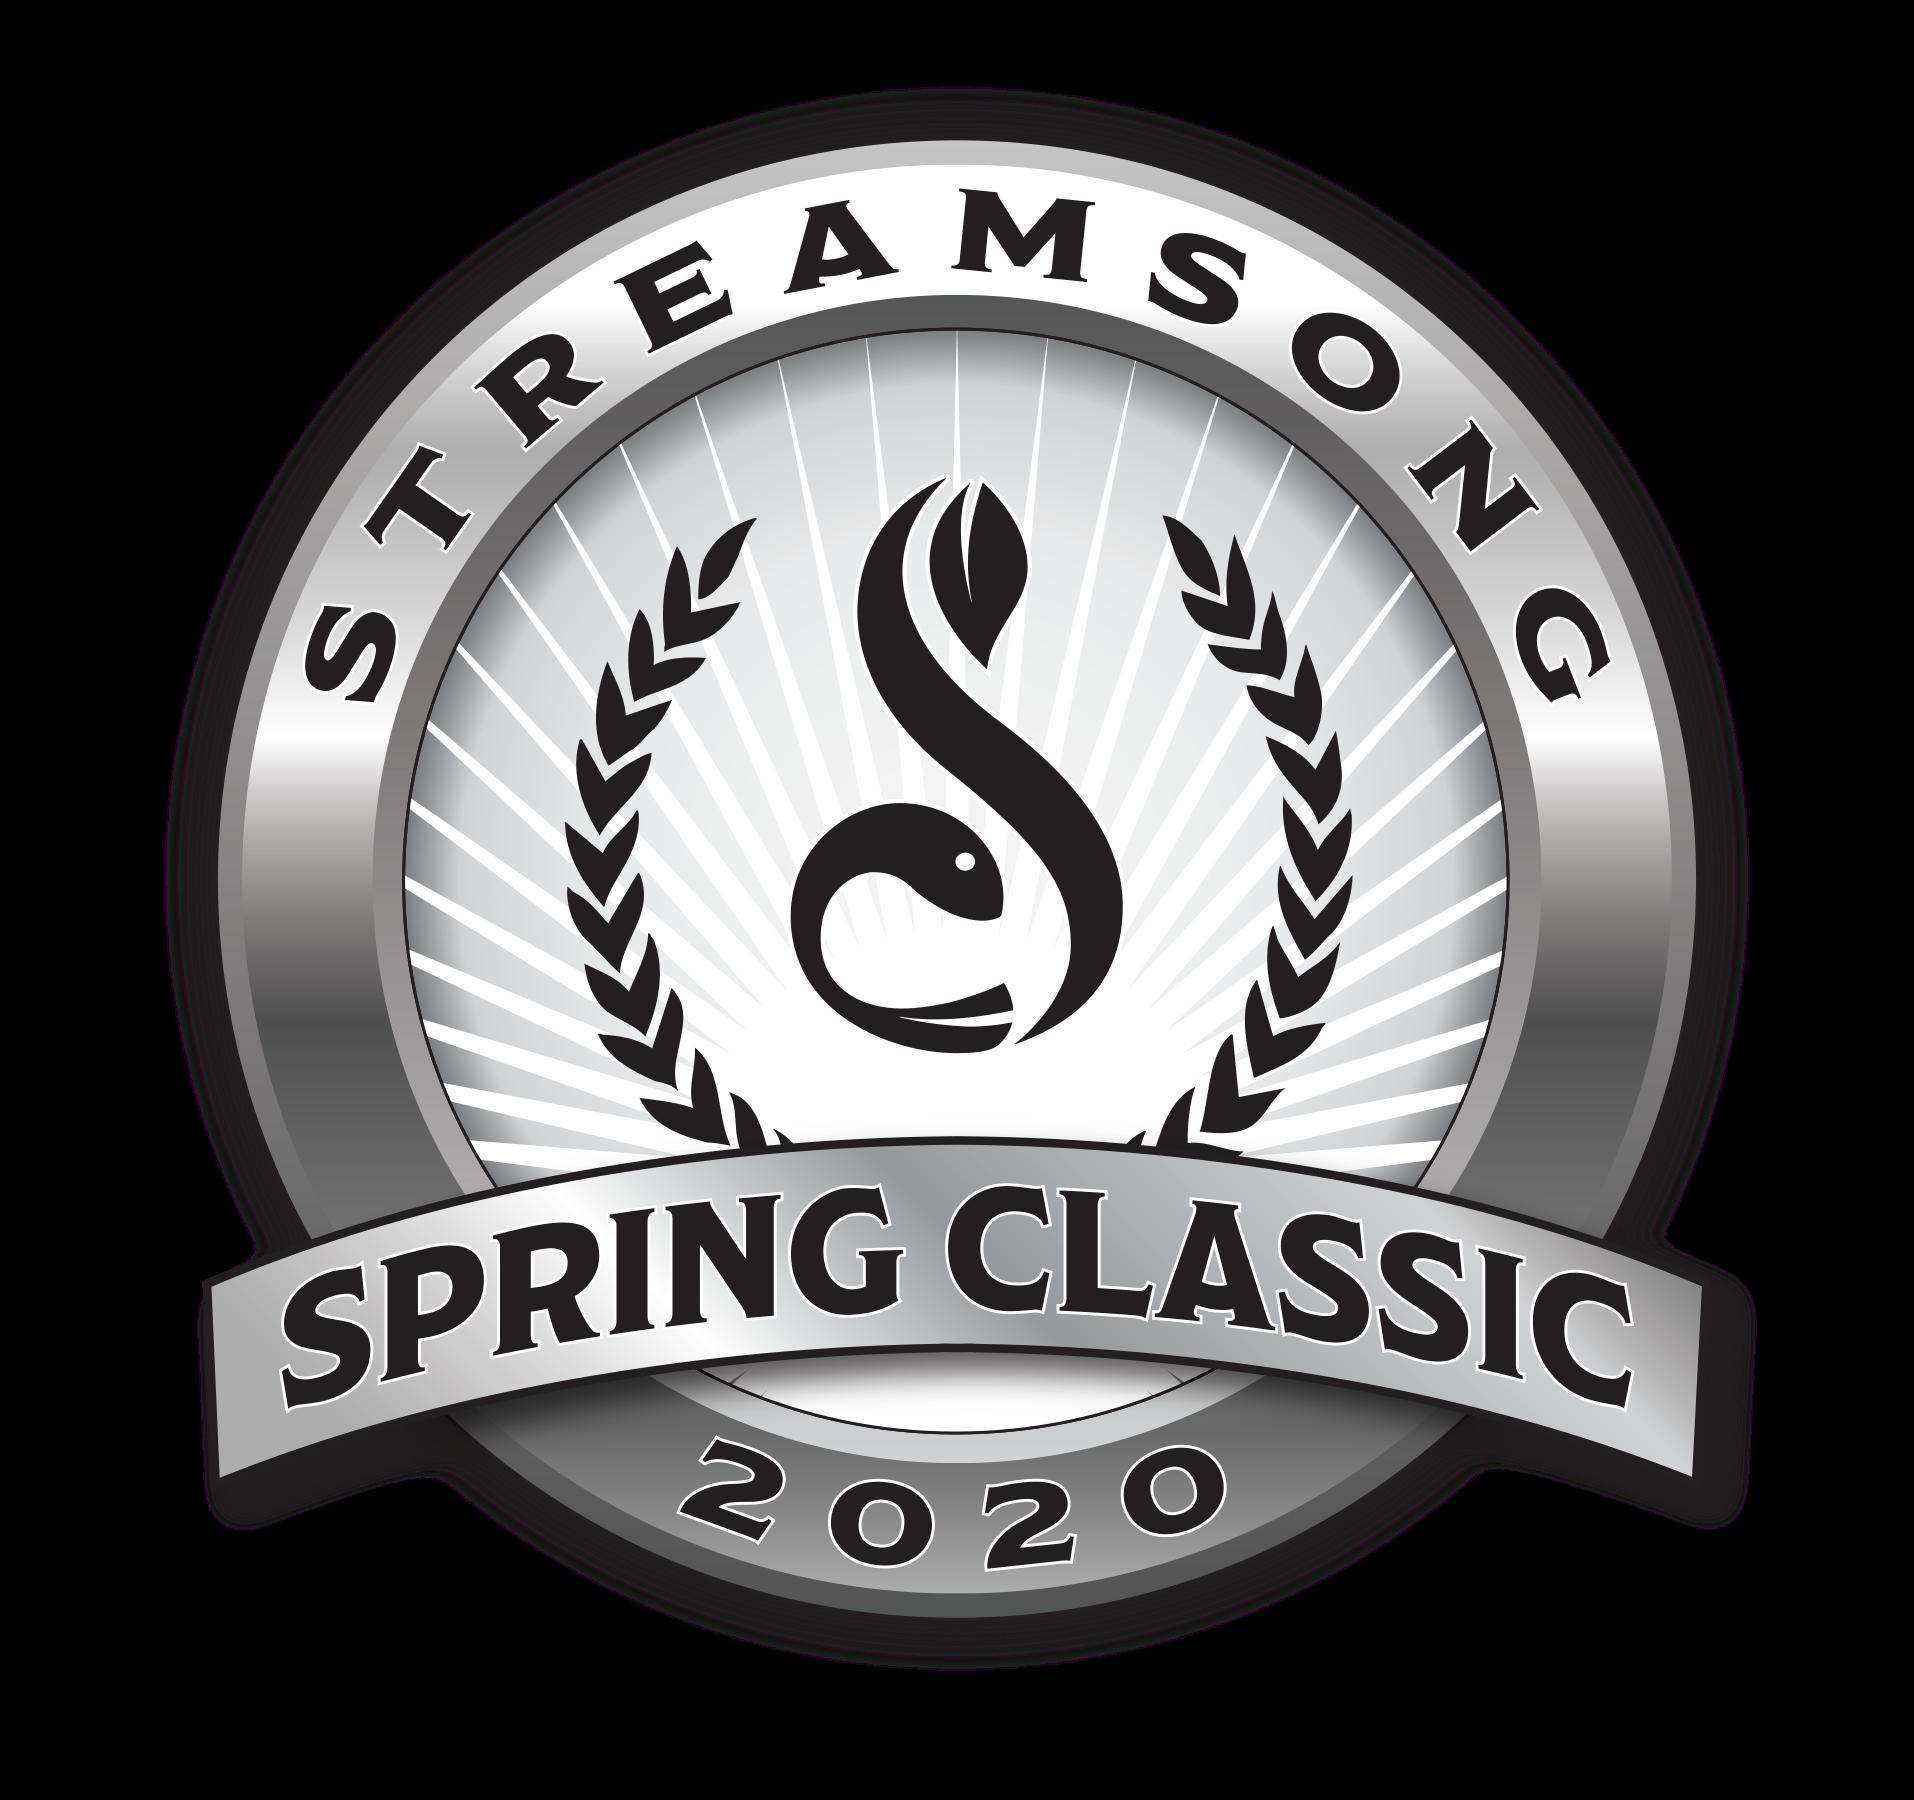 Streamsong Spring Classic '20's Logo